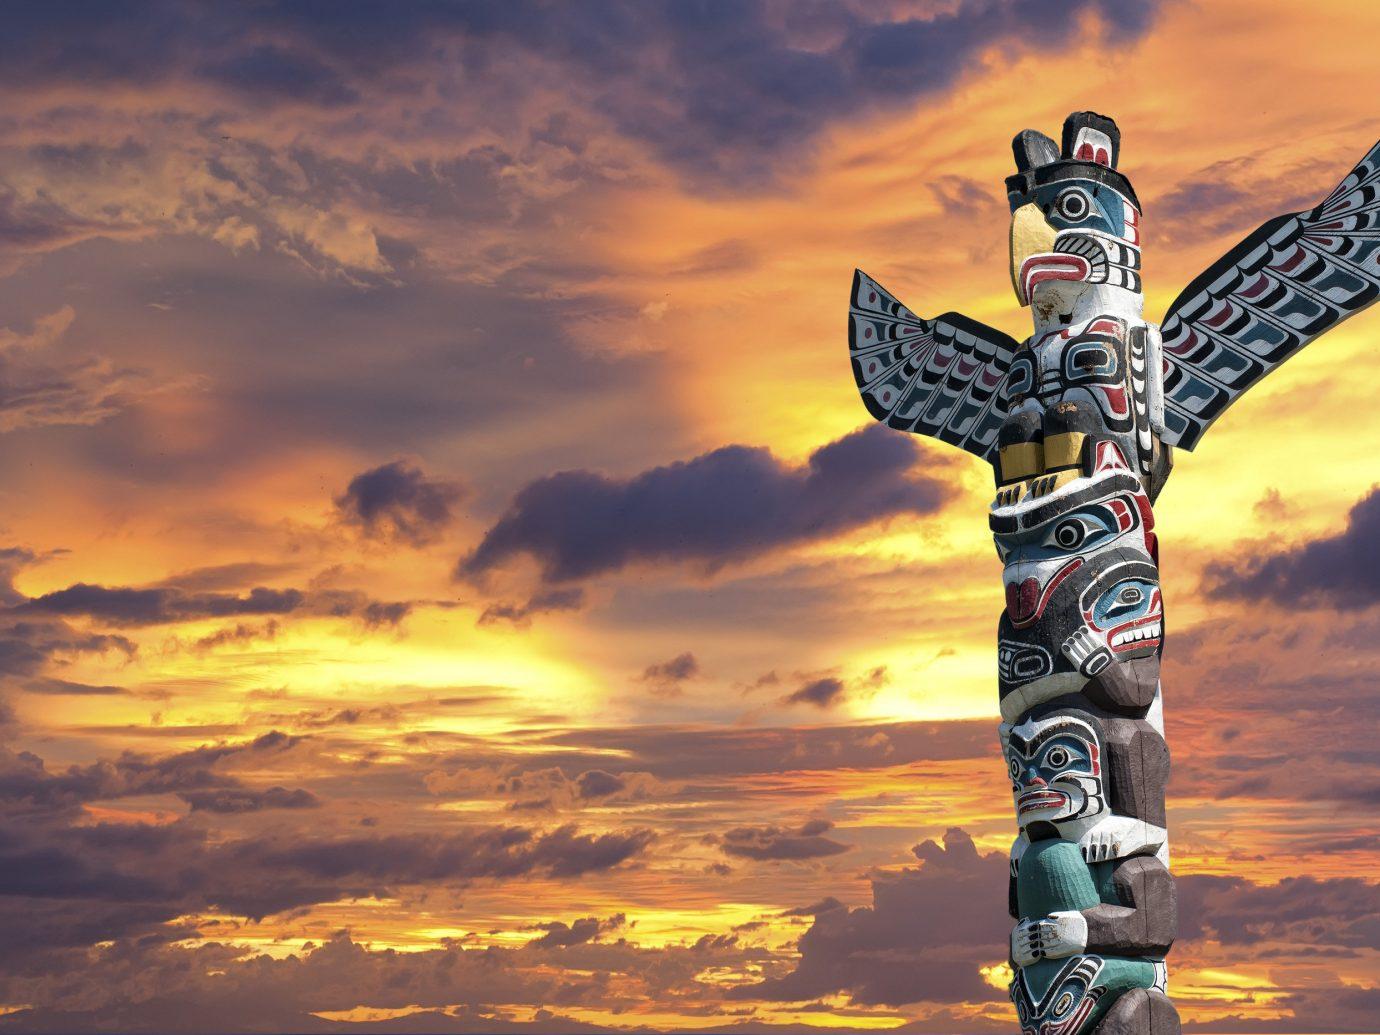 Trip Ideas sky outdoor object totem pole outdoor Sunset cloud cloudy clouds evening air sunrise dusk